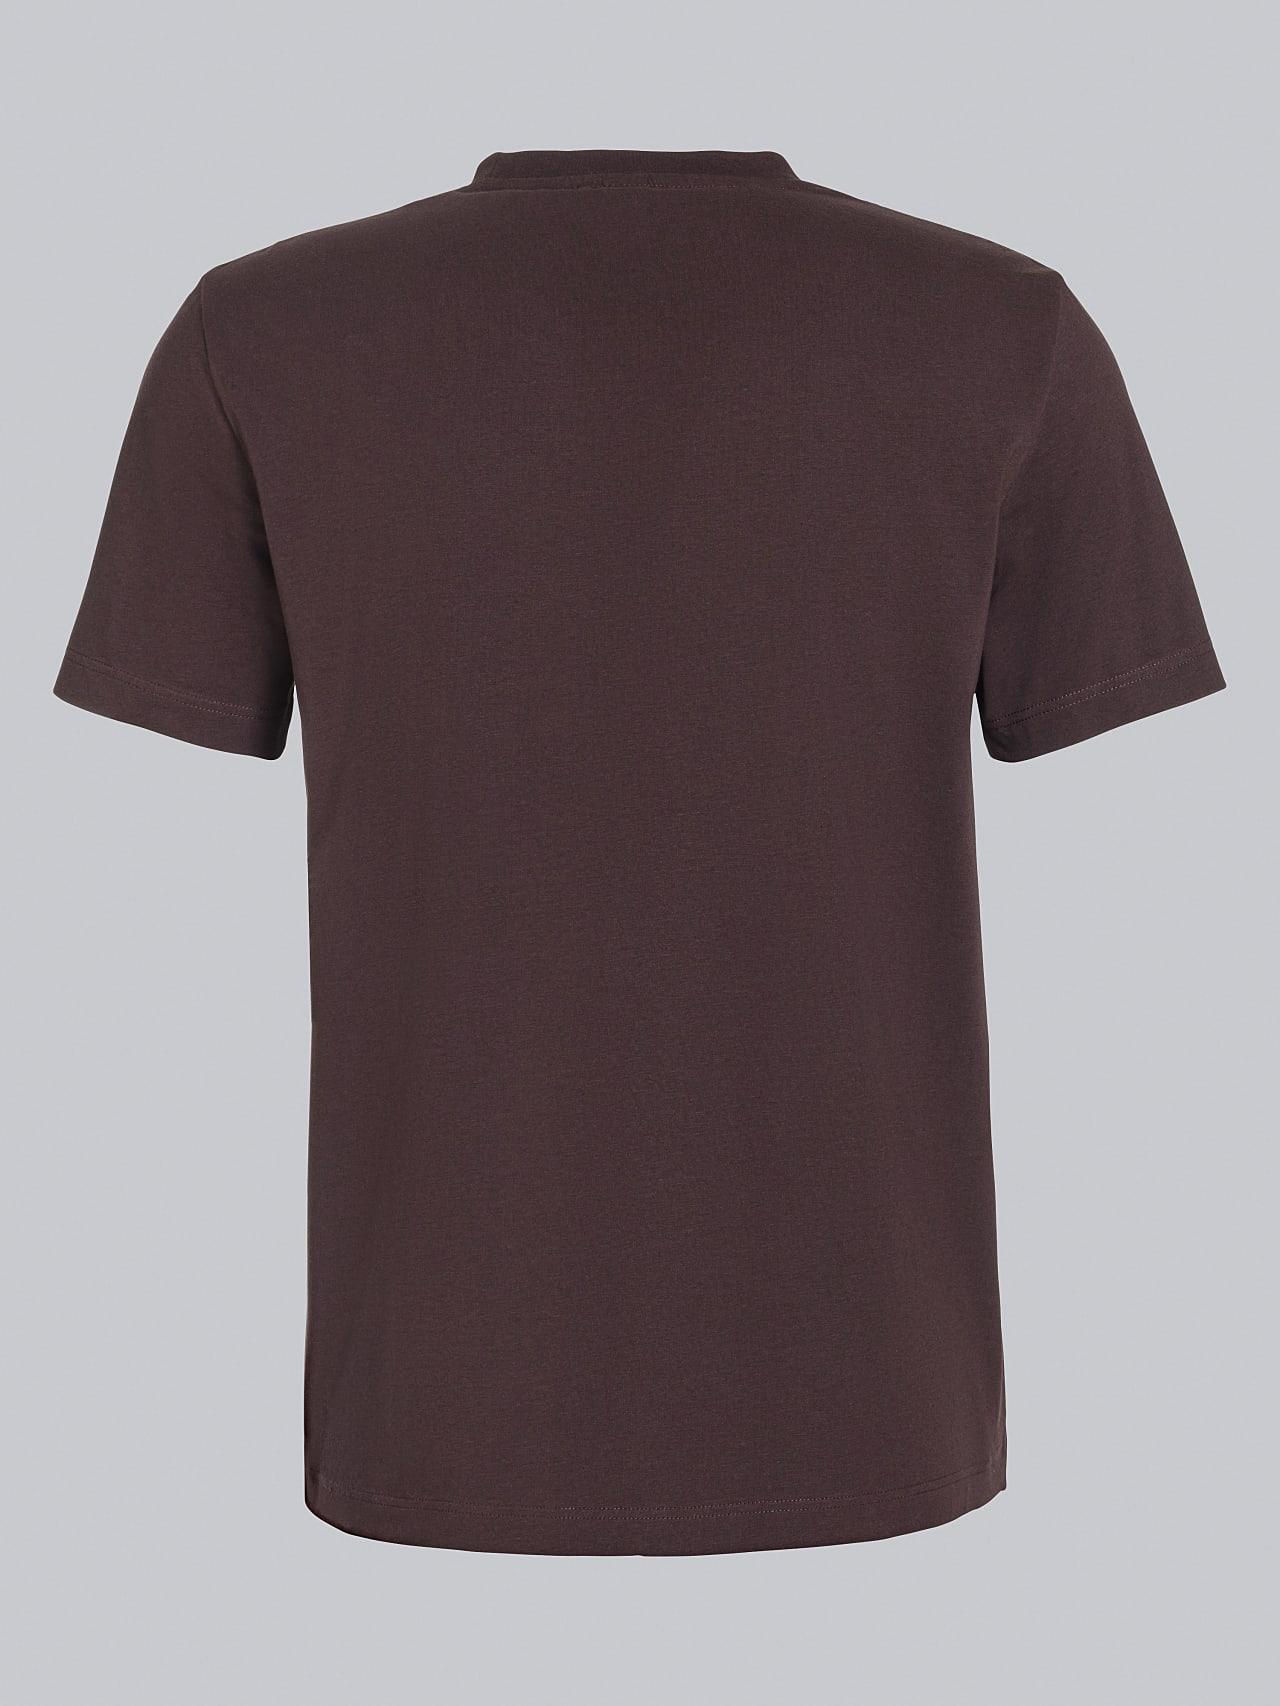 JANOS V3.Y5.02 Logo Embroidery T-Shirt Burgundy Left Alpha Tauri